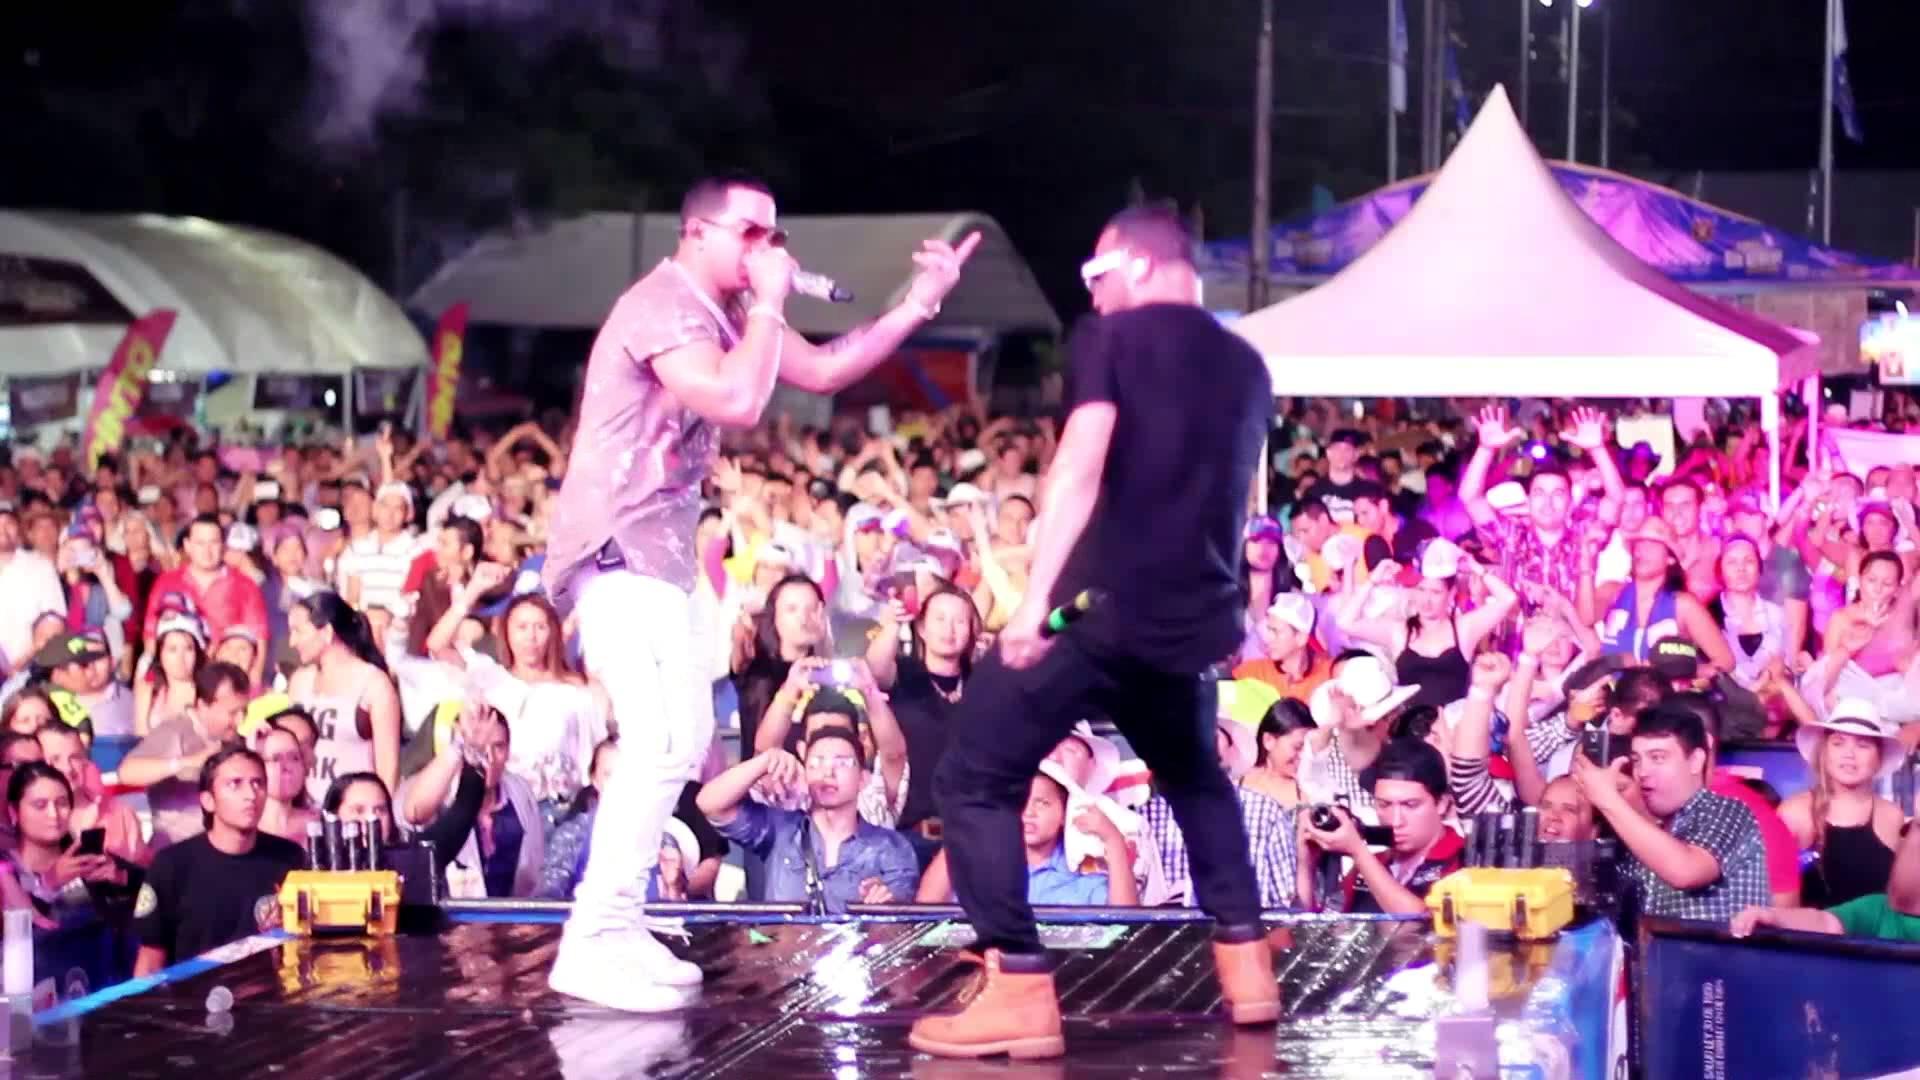 j alvarez bucaramanga tour 2o15 - J Alvarez – Bucaramanga Tour (2o15)